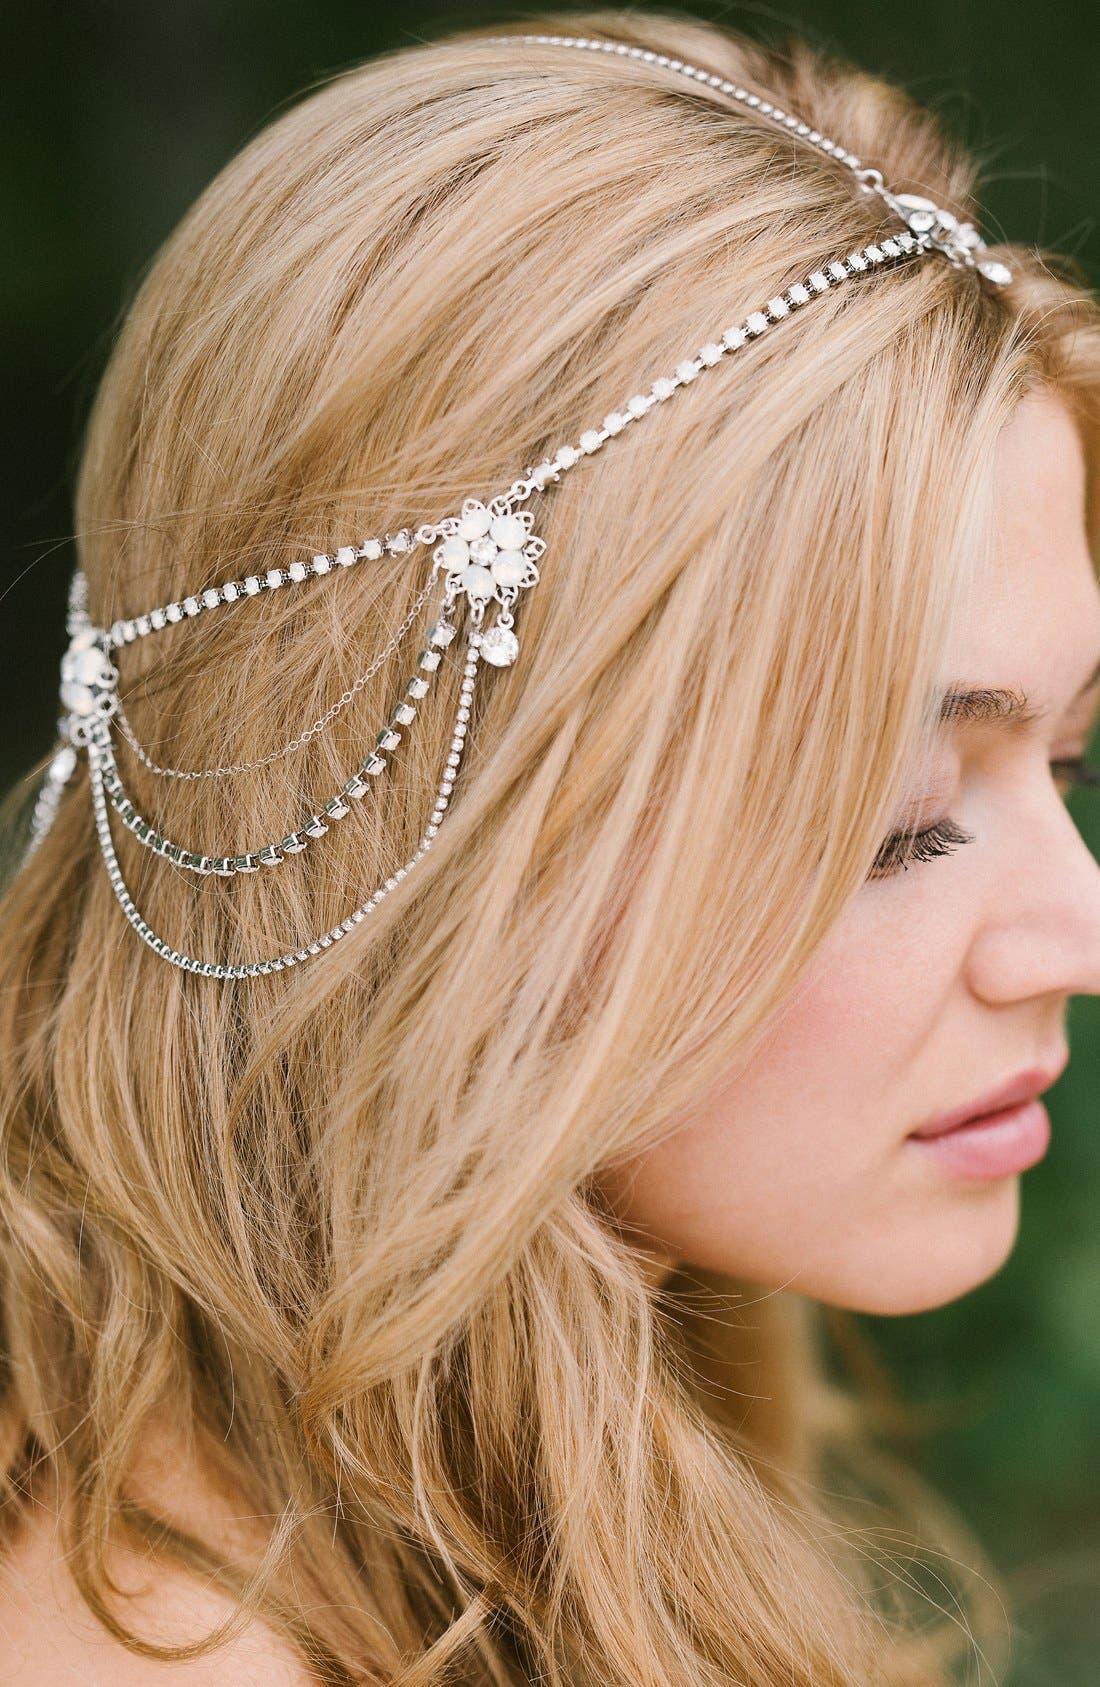 SARA GABRIEL Madeline Floral Crystal Hair Chain